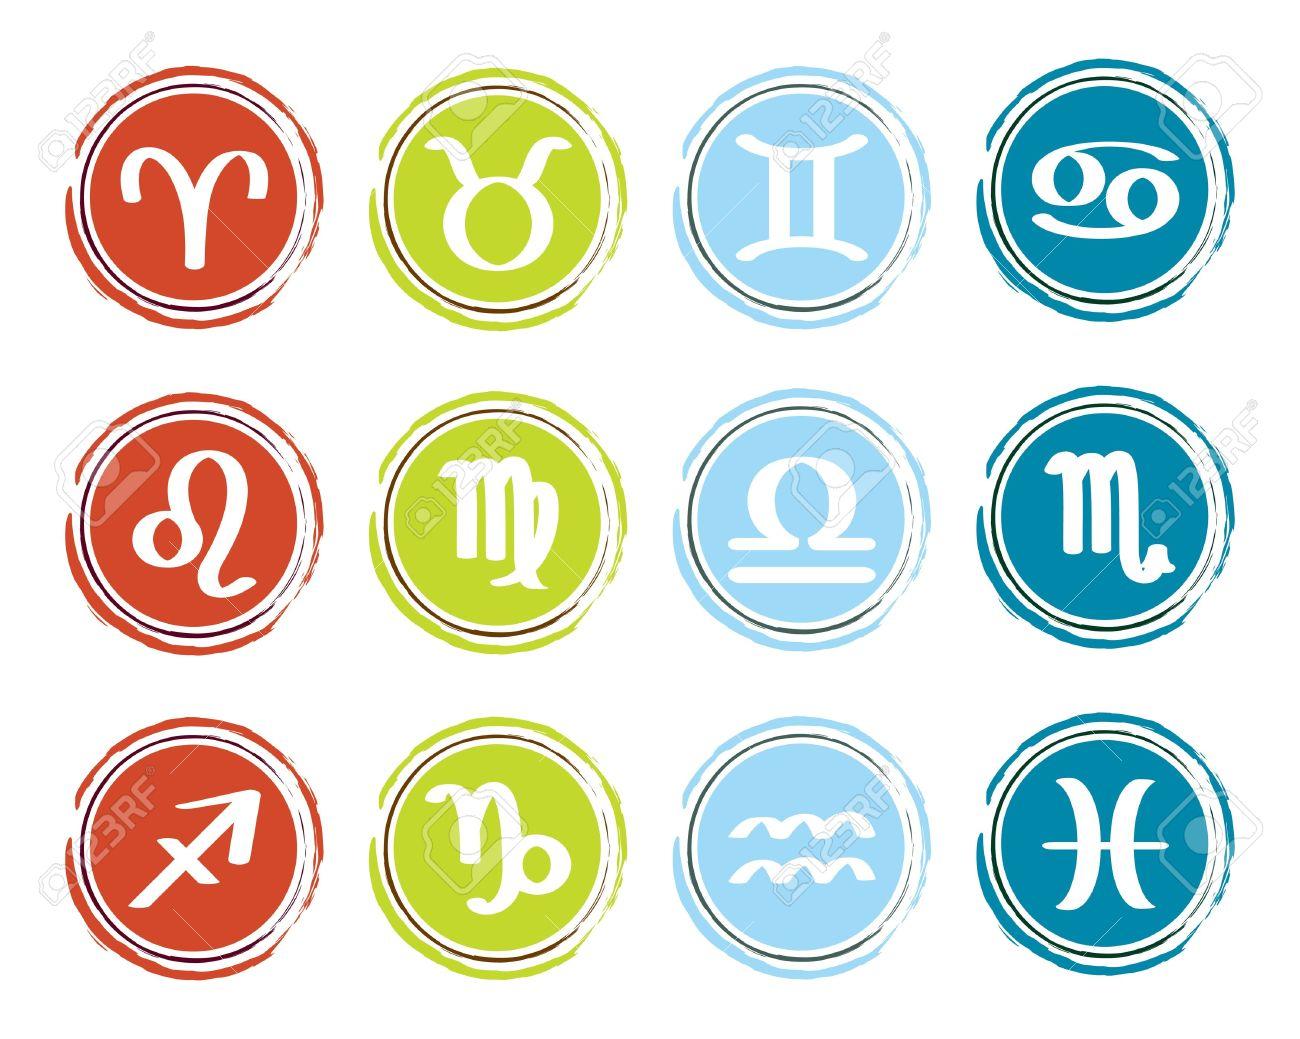 horoscope zodiac signs, set of icons Stock Vector - 13196390